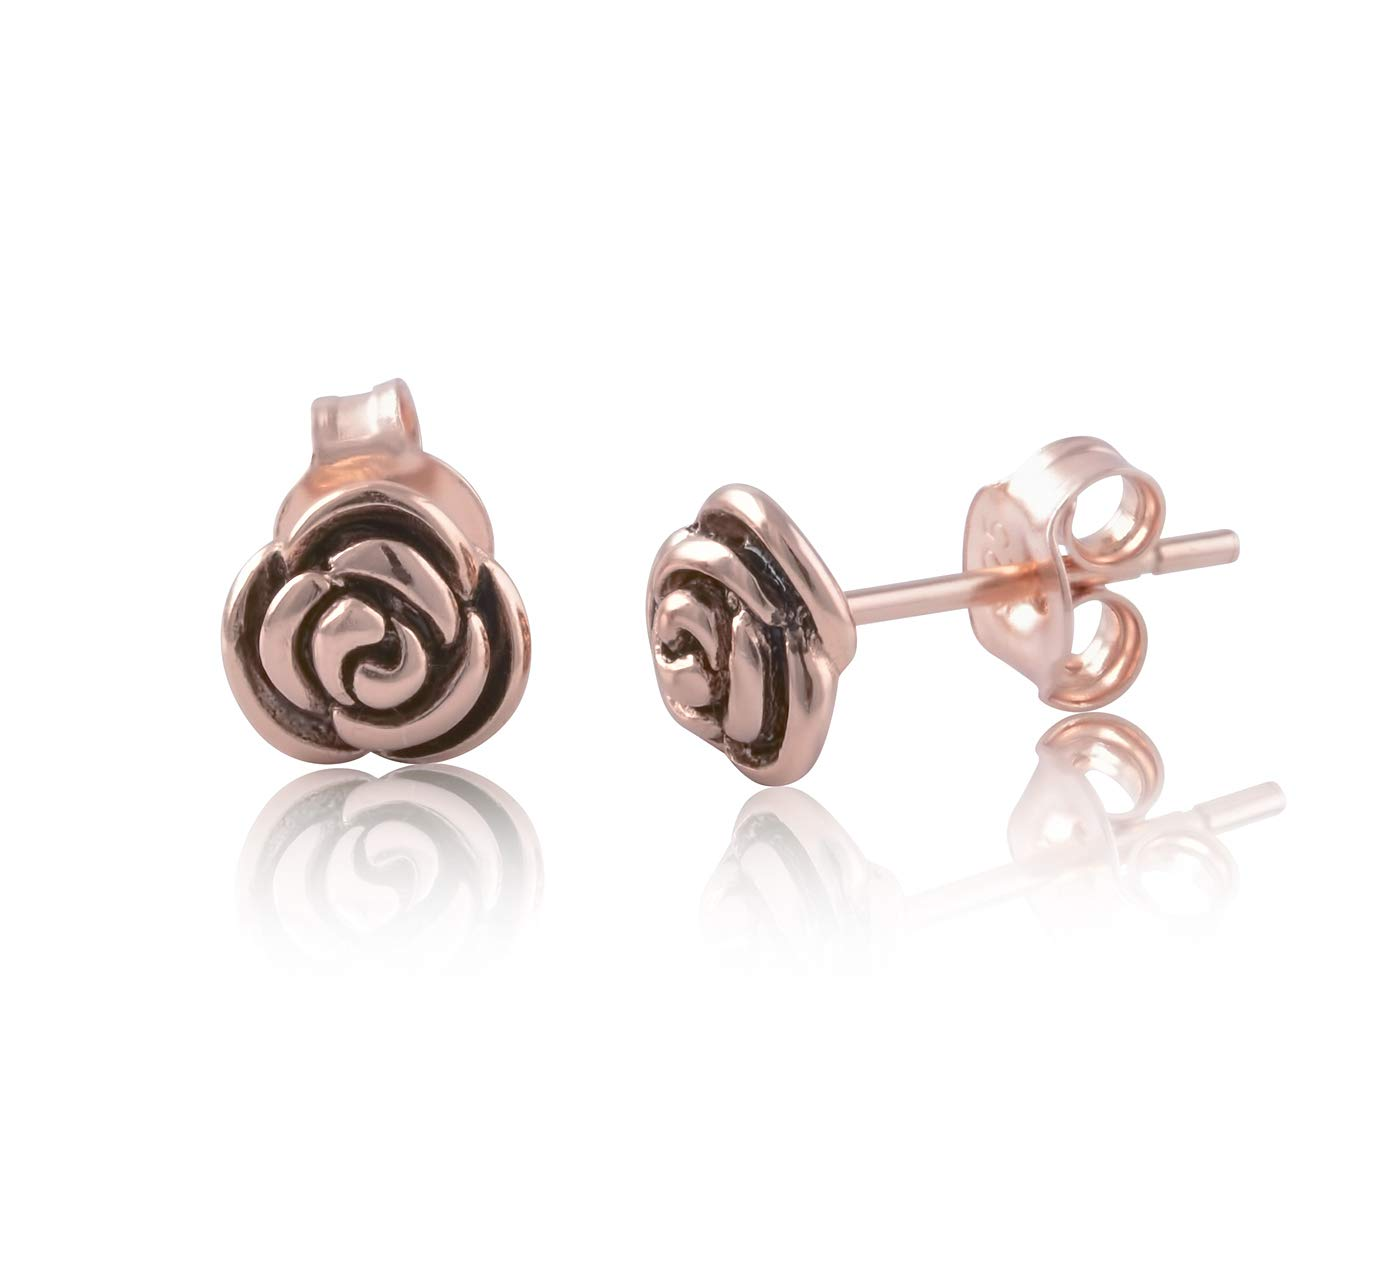 Rose Gold Tone Silver Rose Flower Stud Earrings - 7mm